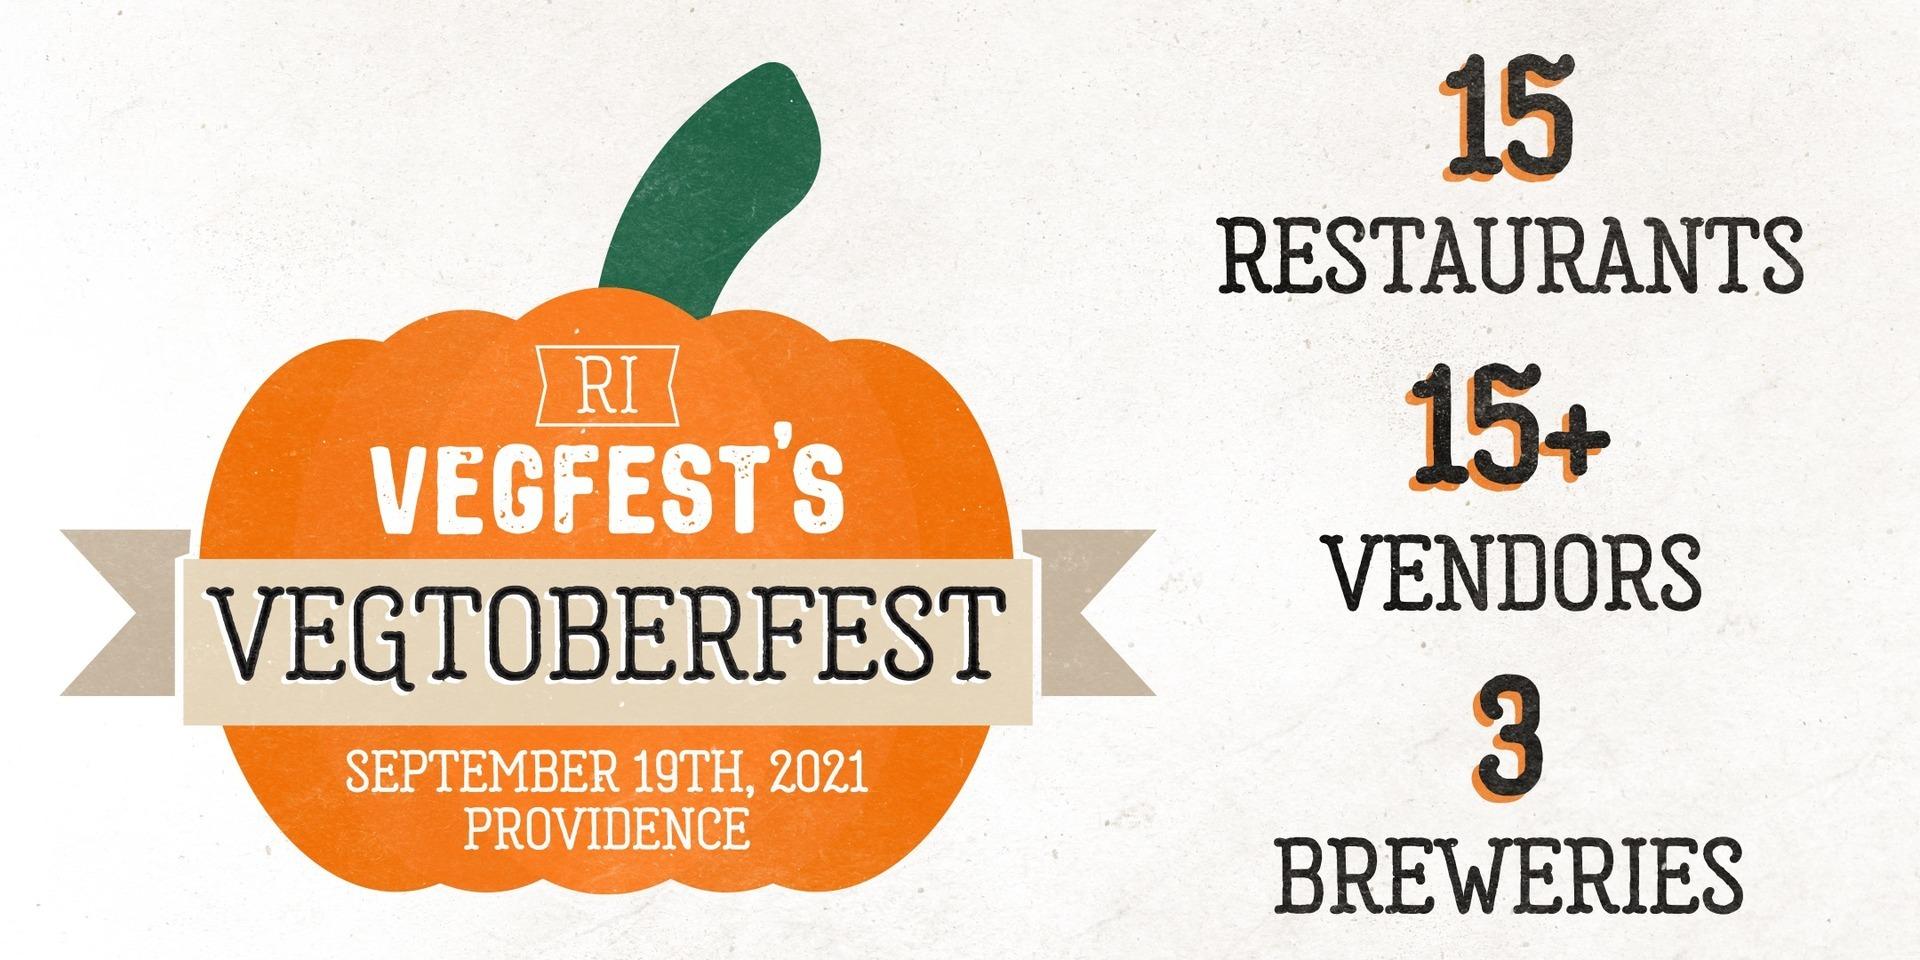 RI VegFest's VEGTOBERFEST